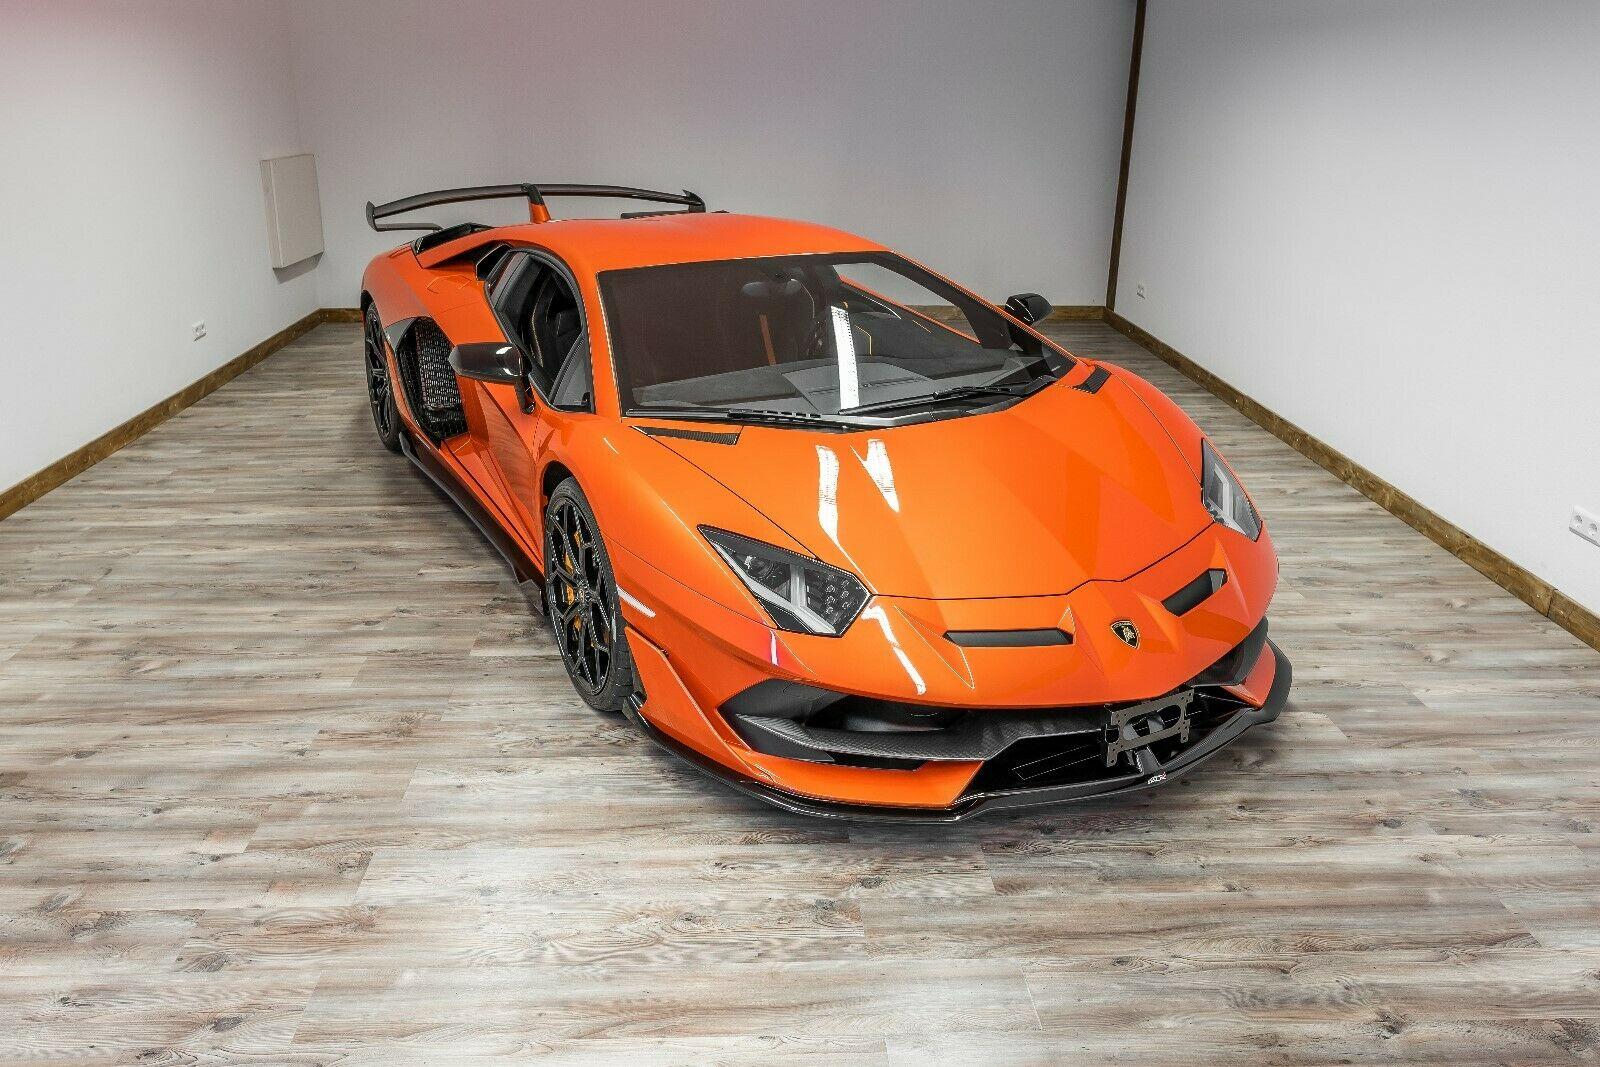 Lamborghini Aventador Svj Luxury Pulse Cars Germany For Sale On Luxurypulse